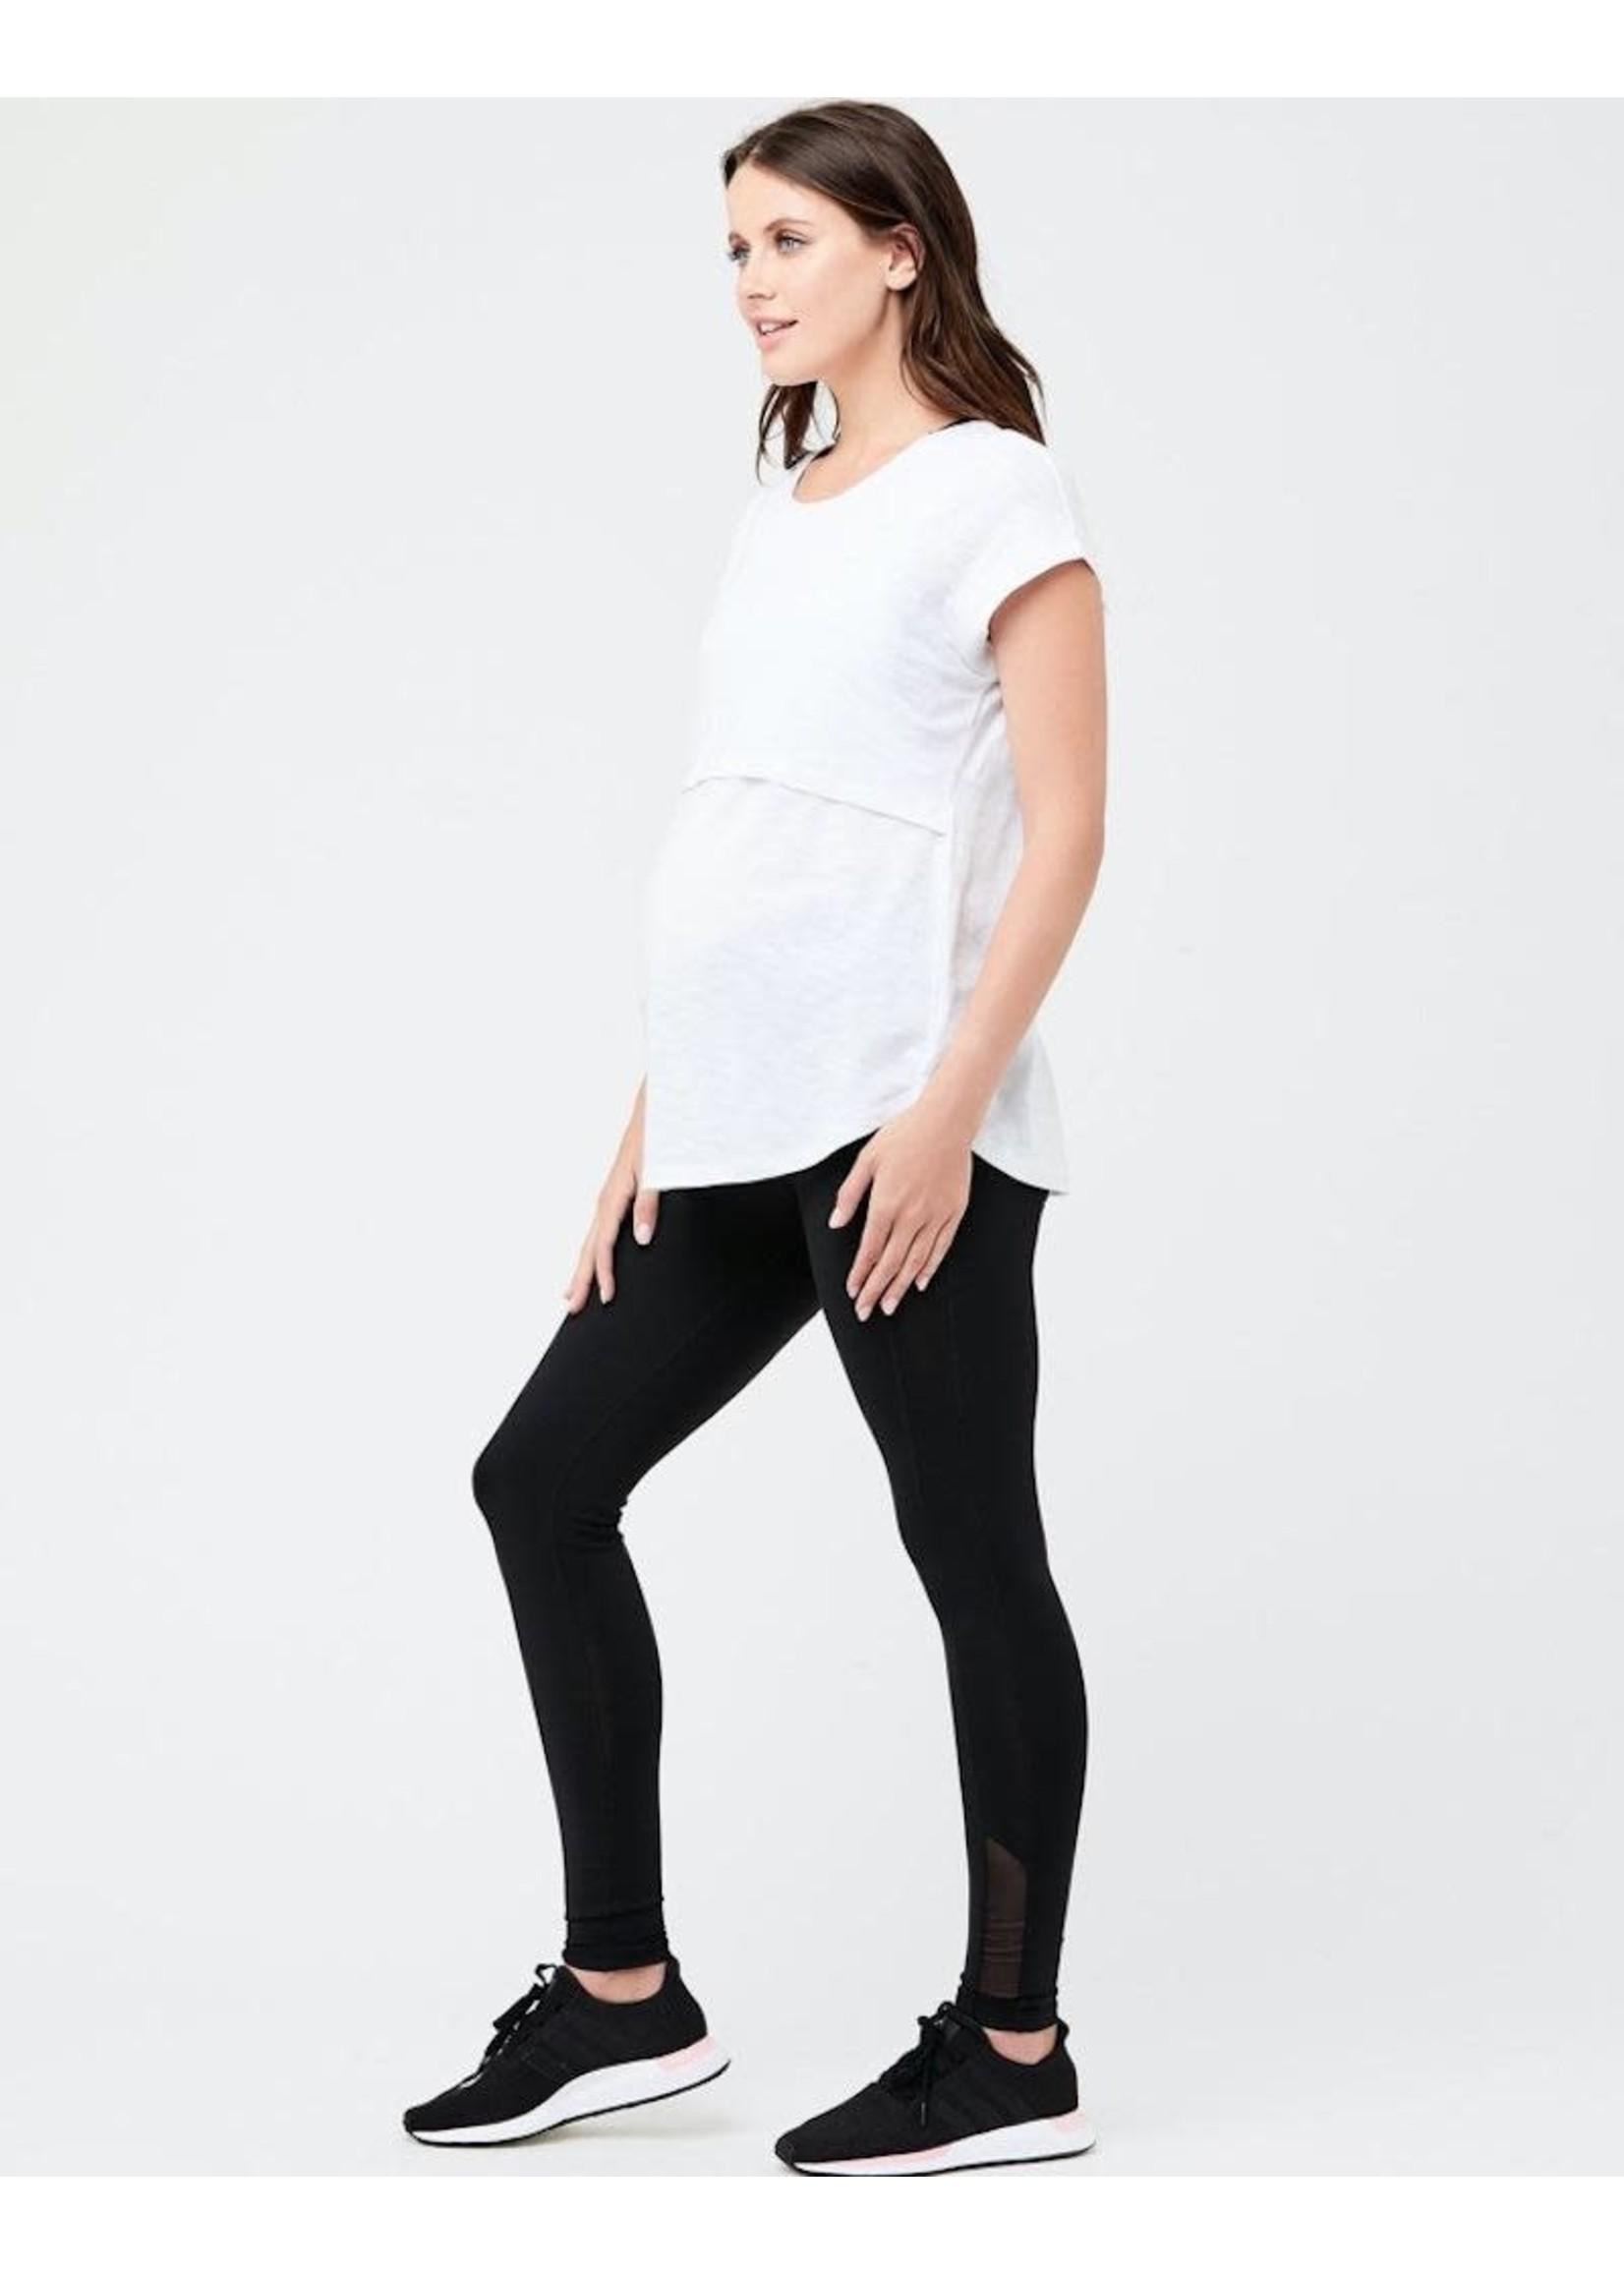 Ripe Maternity RIpe Maternity, Active Over Tummy Legging in Black